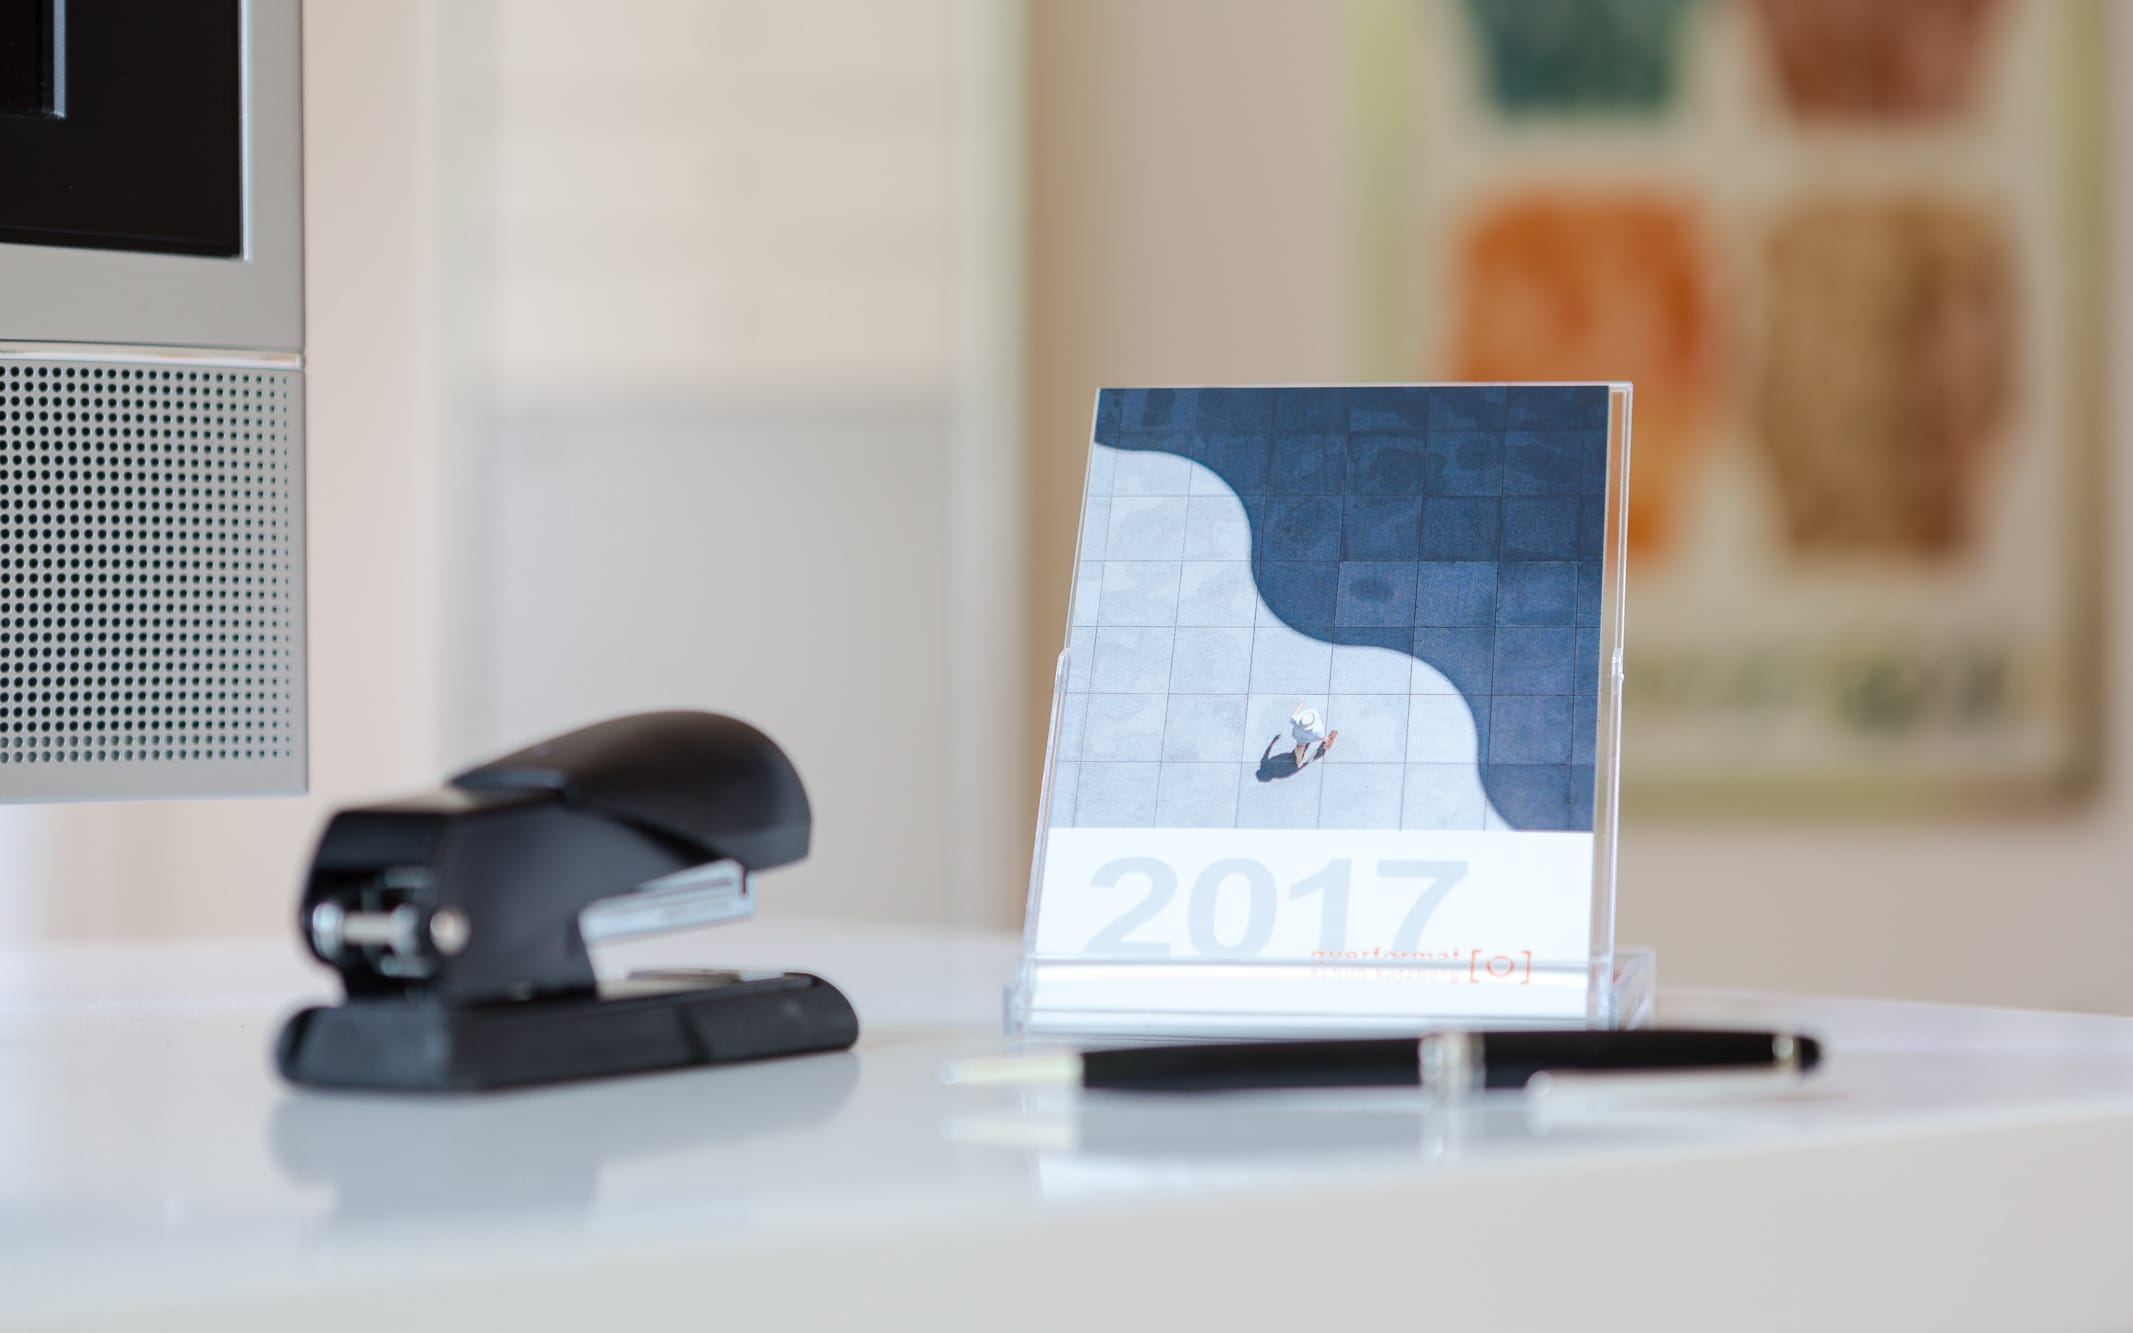 querformat-fotografie - Achim Katzberg - querformat-fotografie – Der Kalender 2017 - querformat-fotografie_kalender_2017